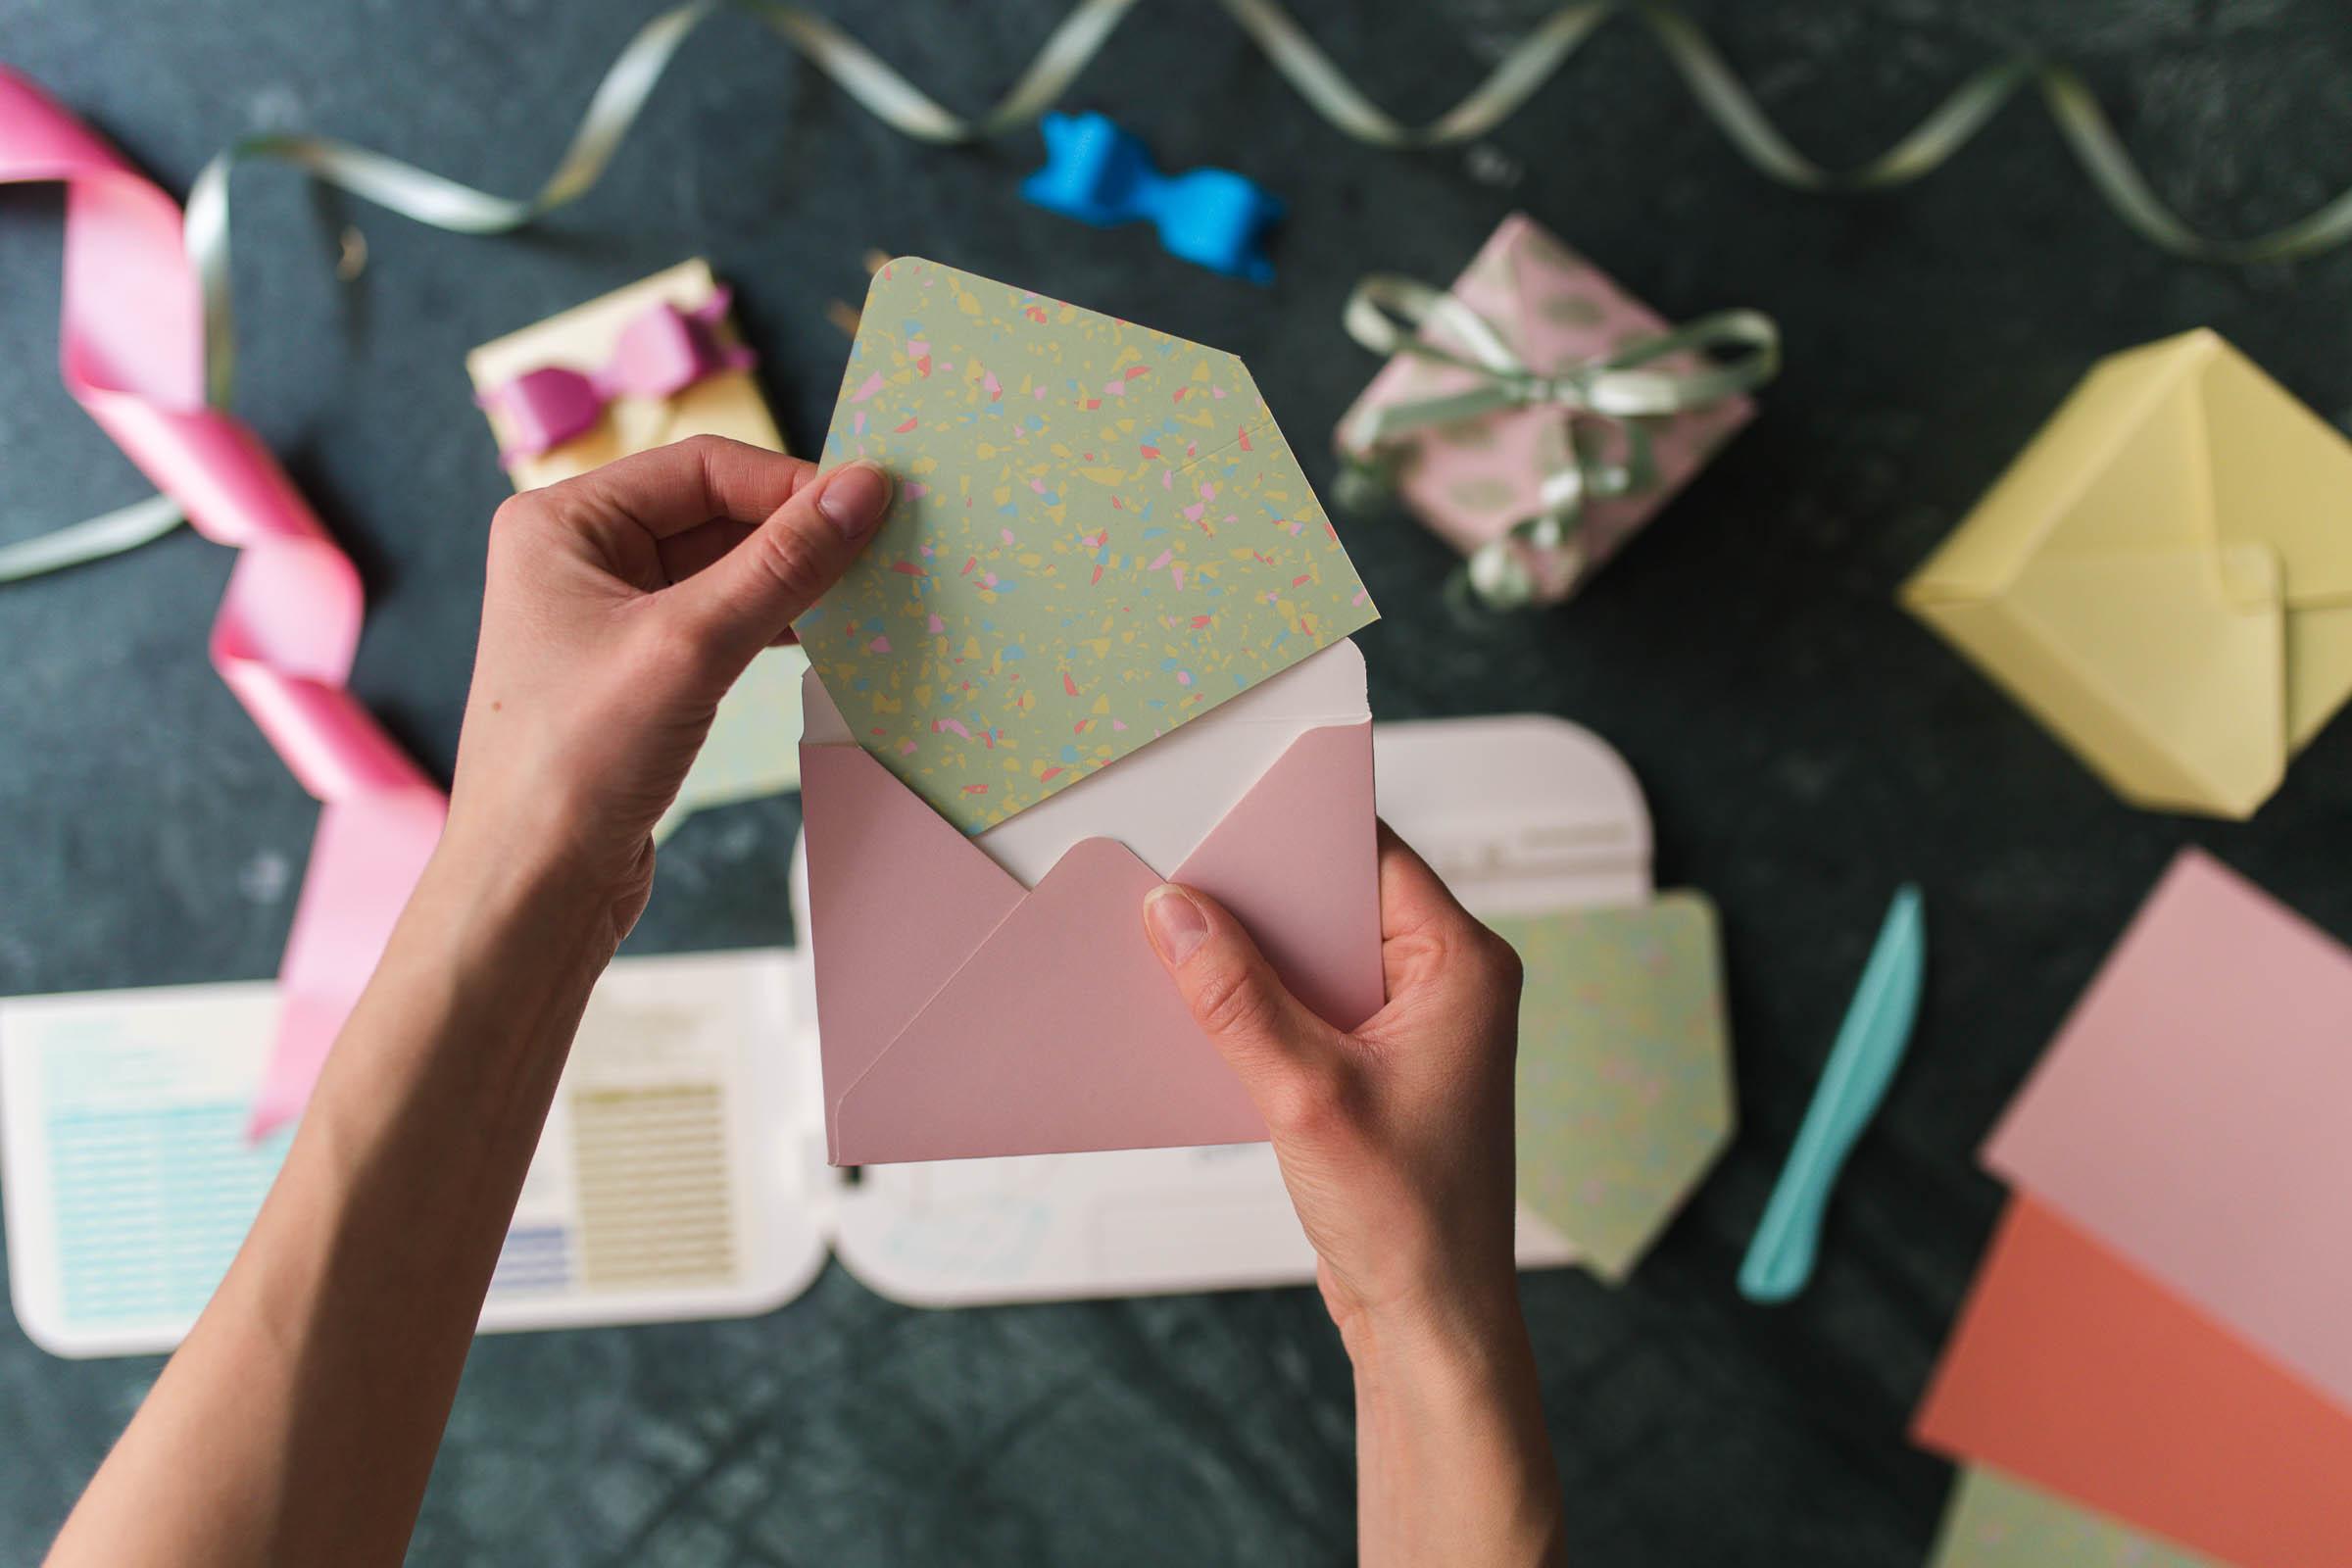 Kalaspyssel - Gör ett kuvert